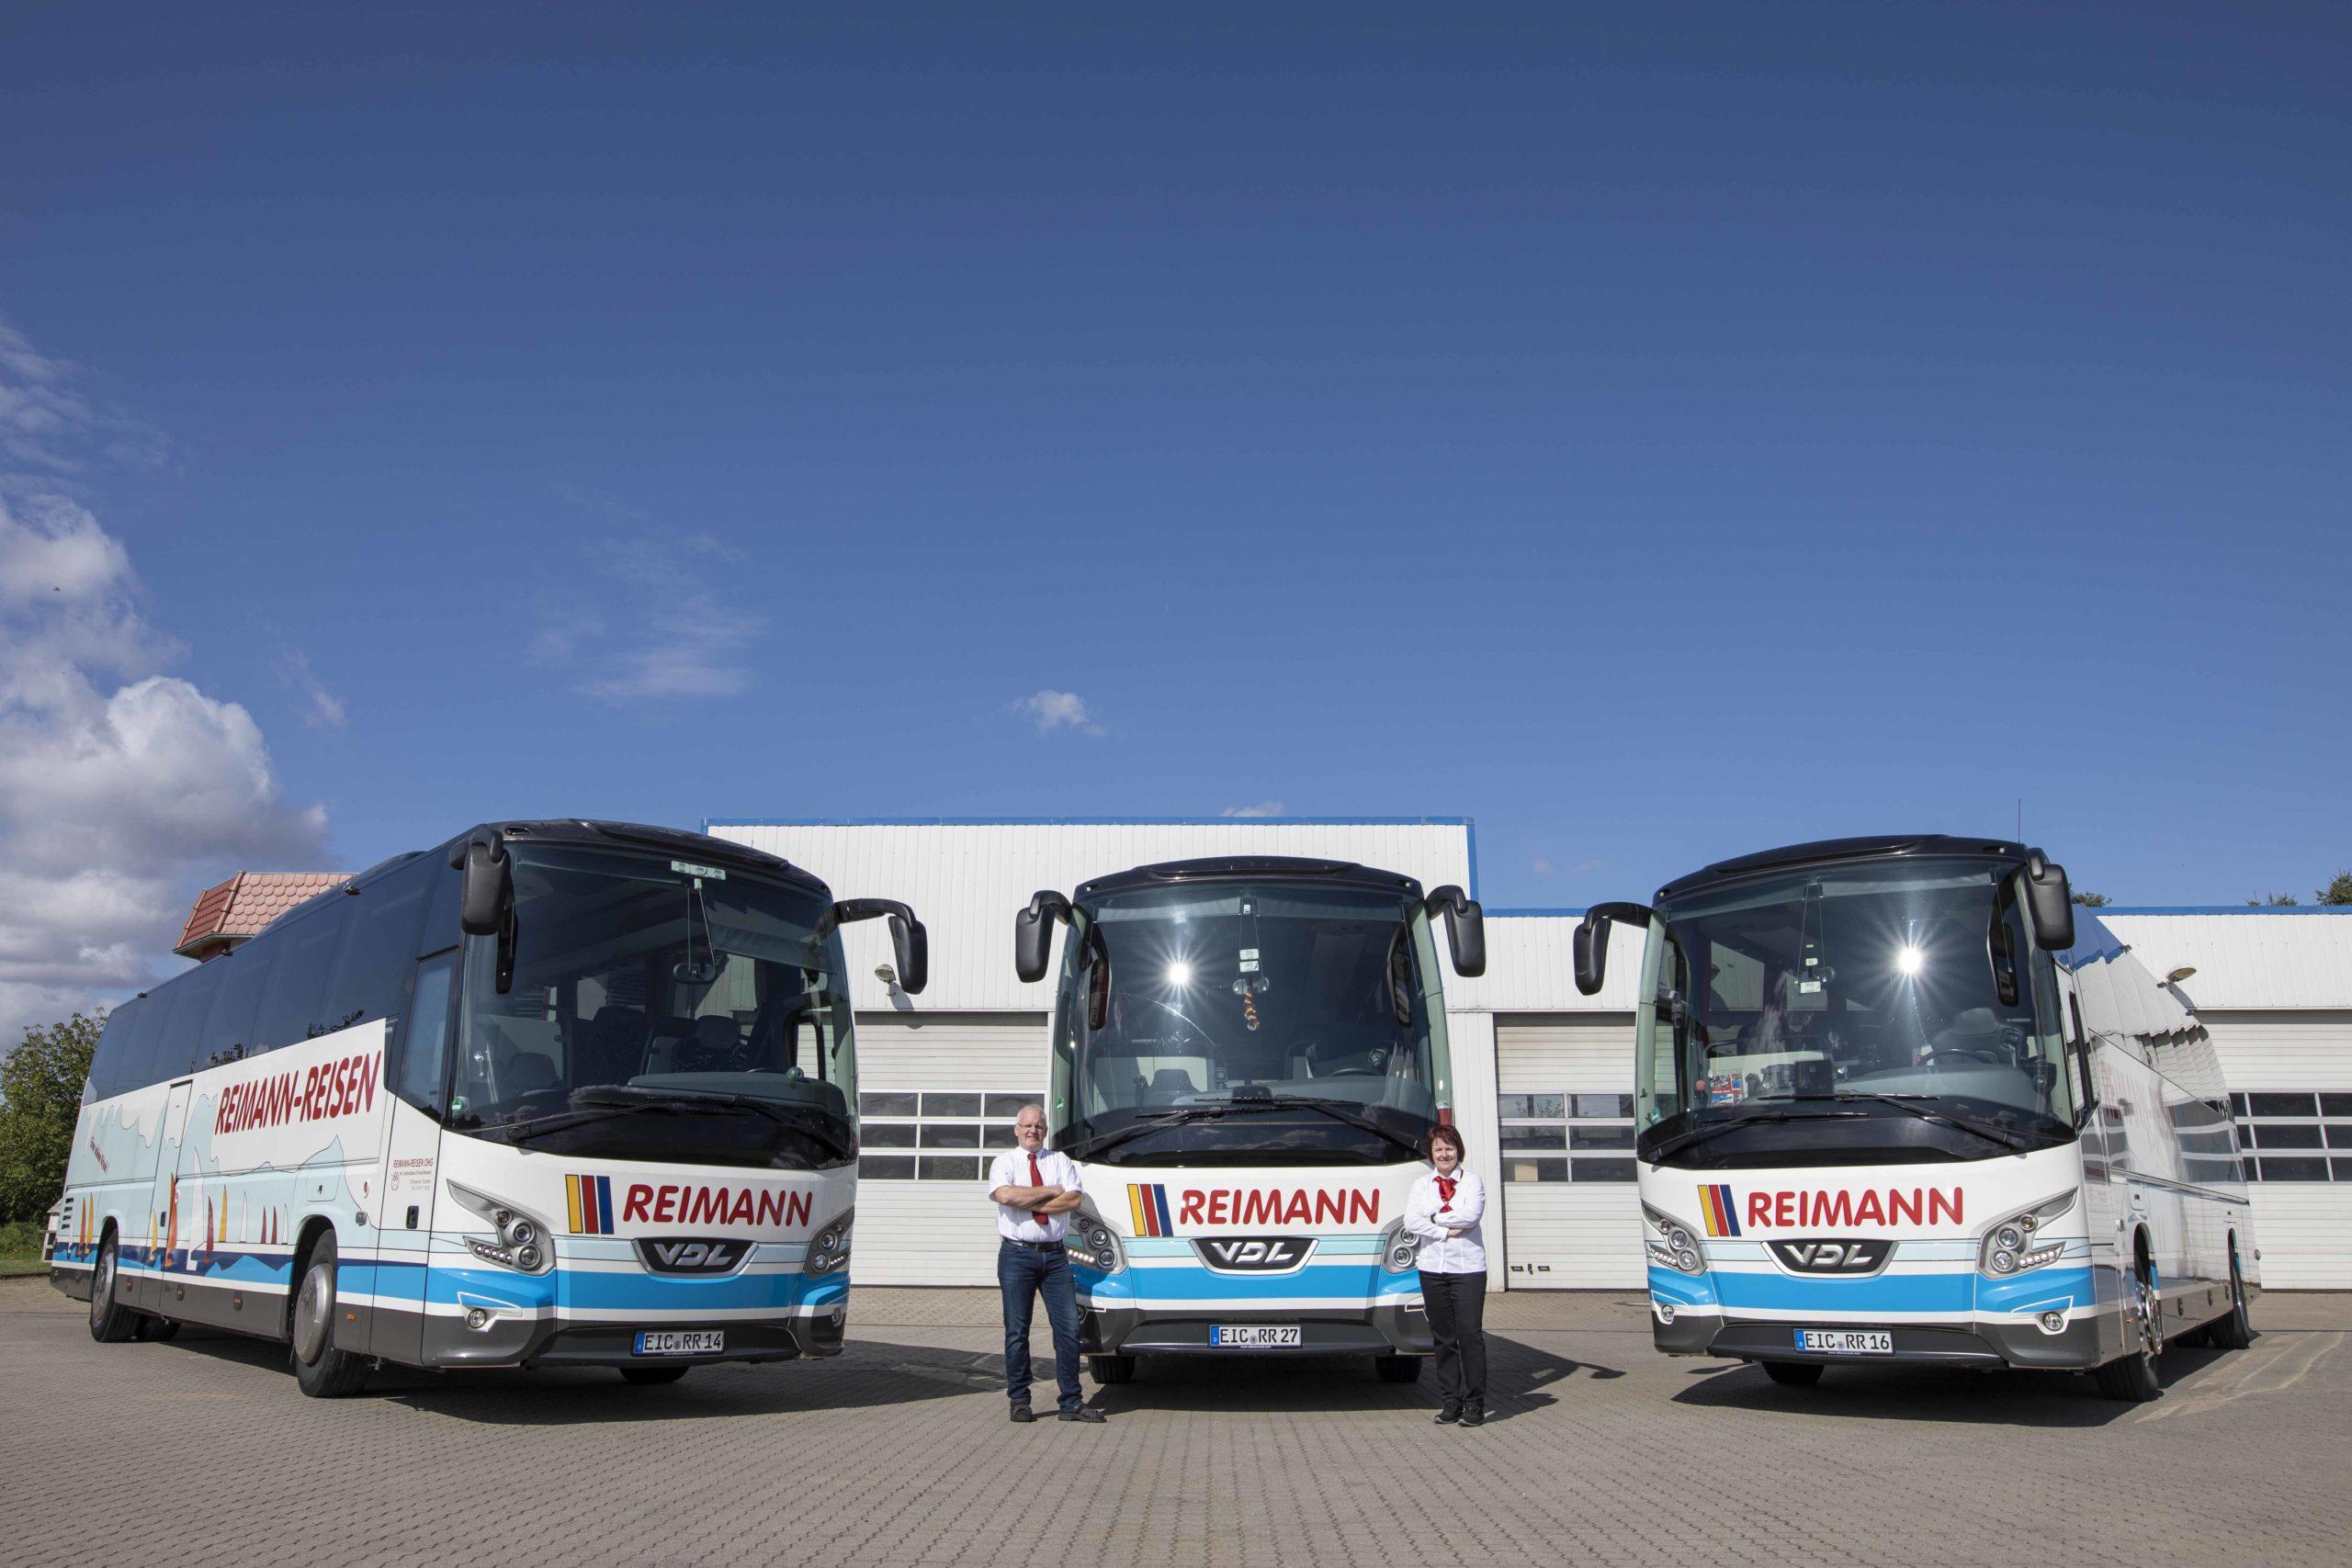 Reimann-Reisen Team Ecklingerode Firmengebäude